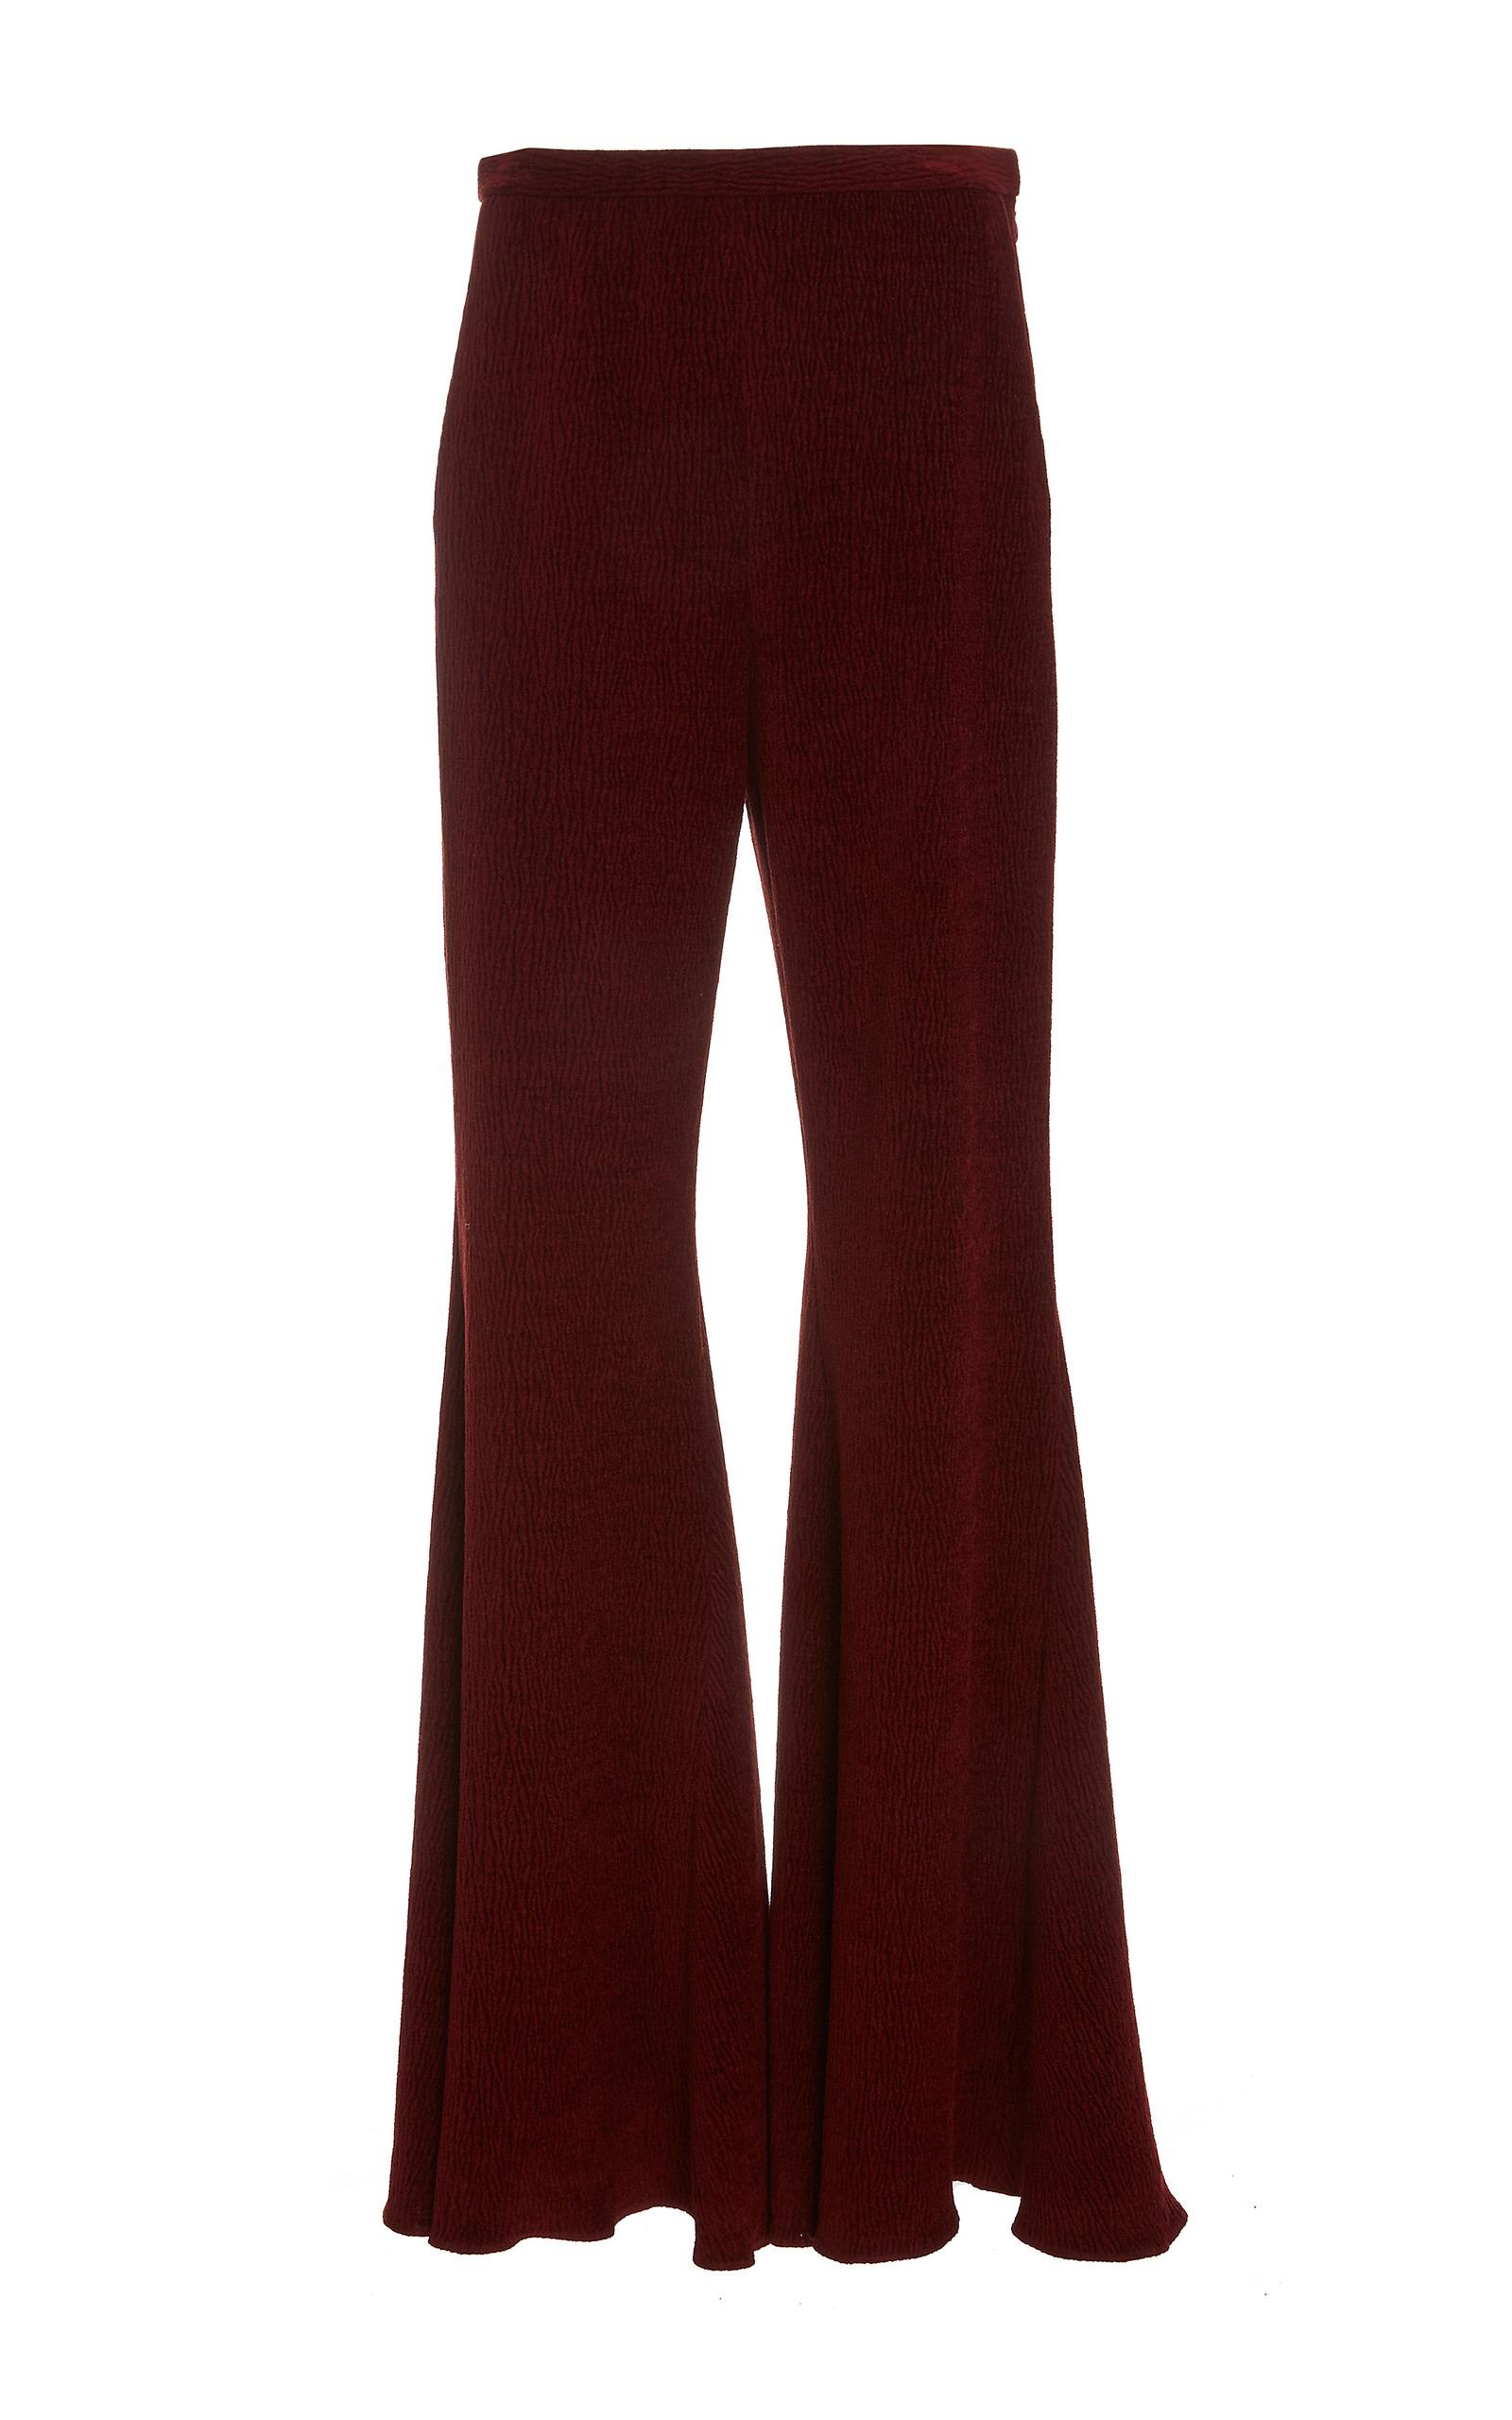 Rosetta Getty Straight Flare Trouser In Red